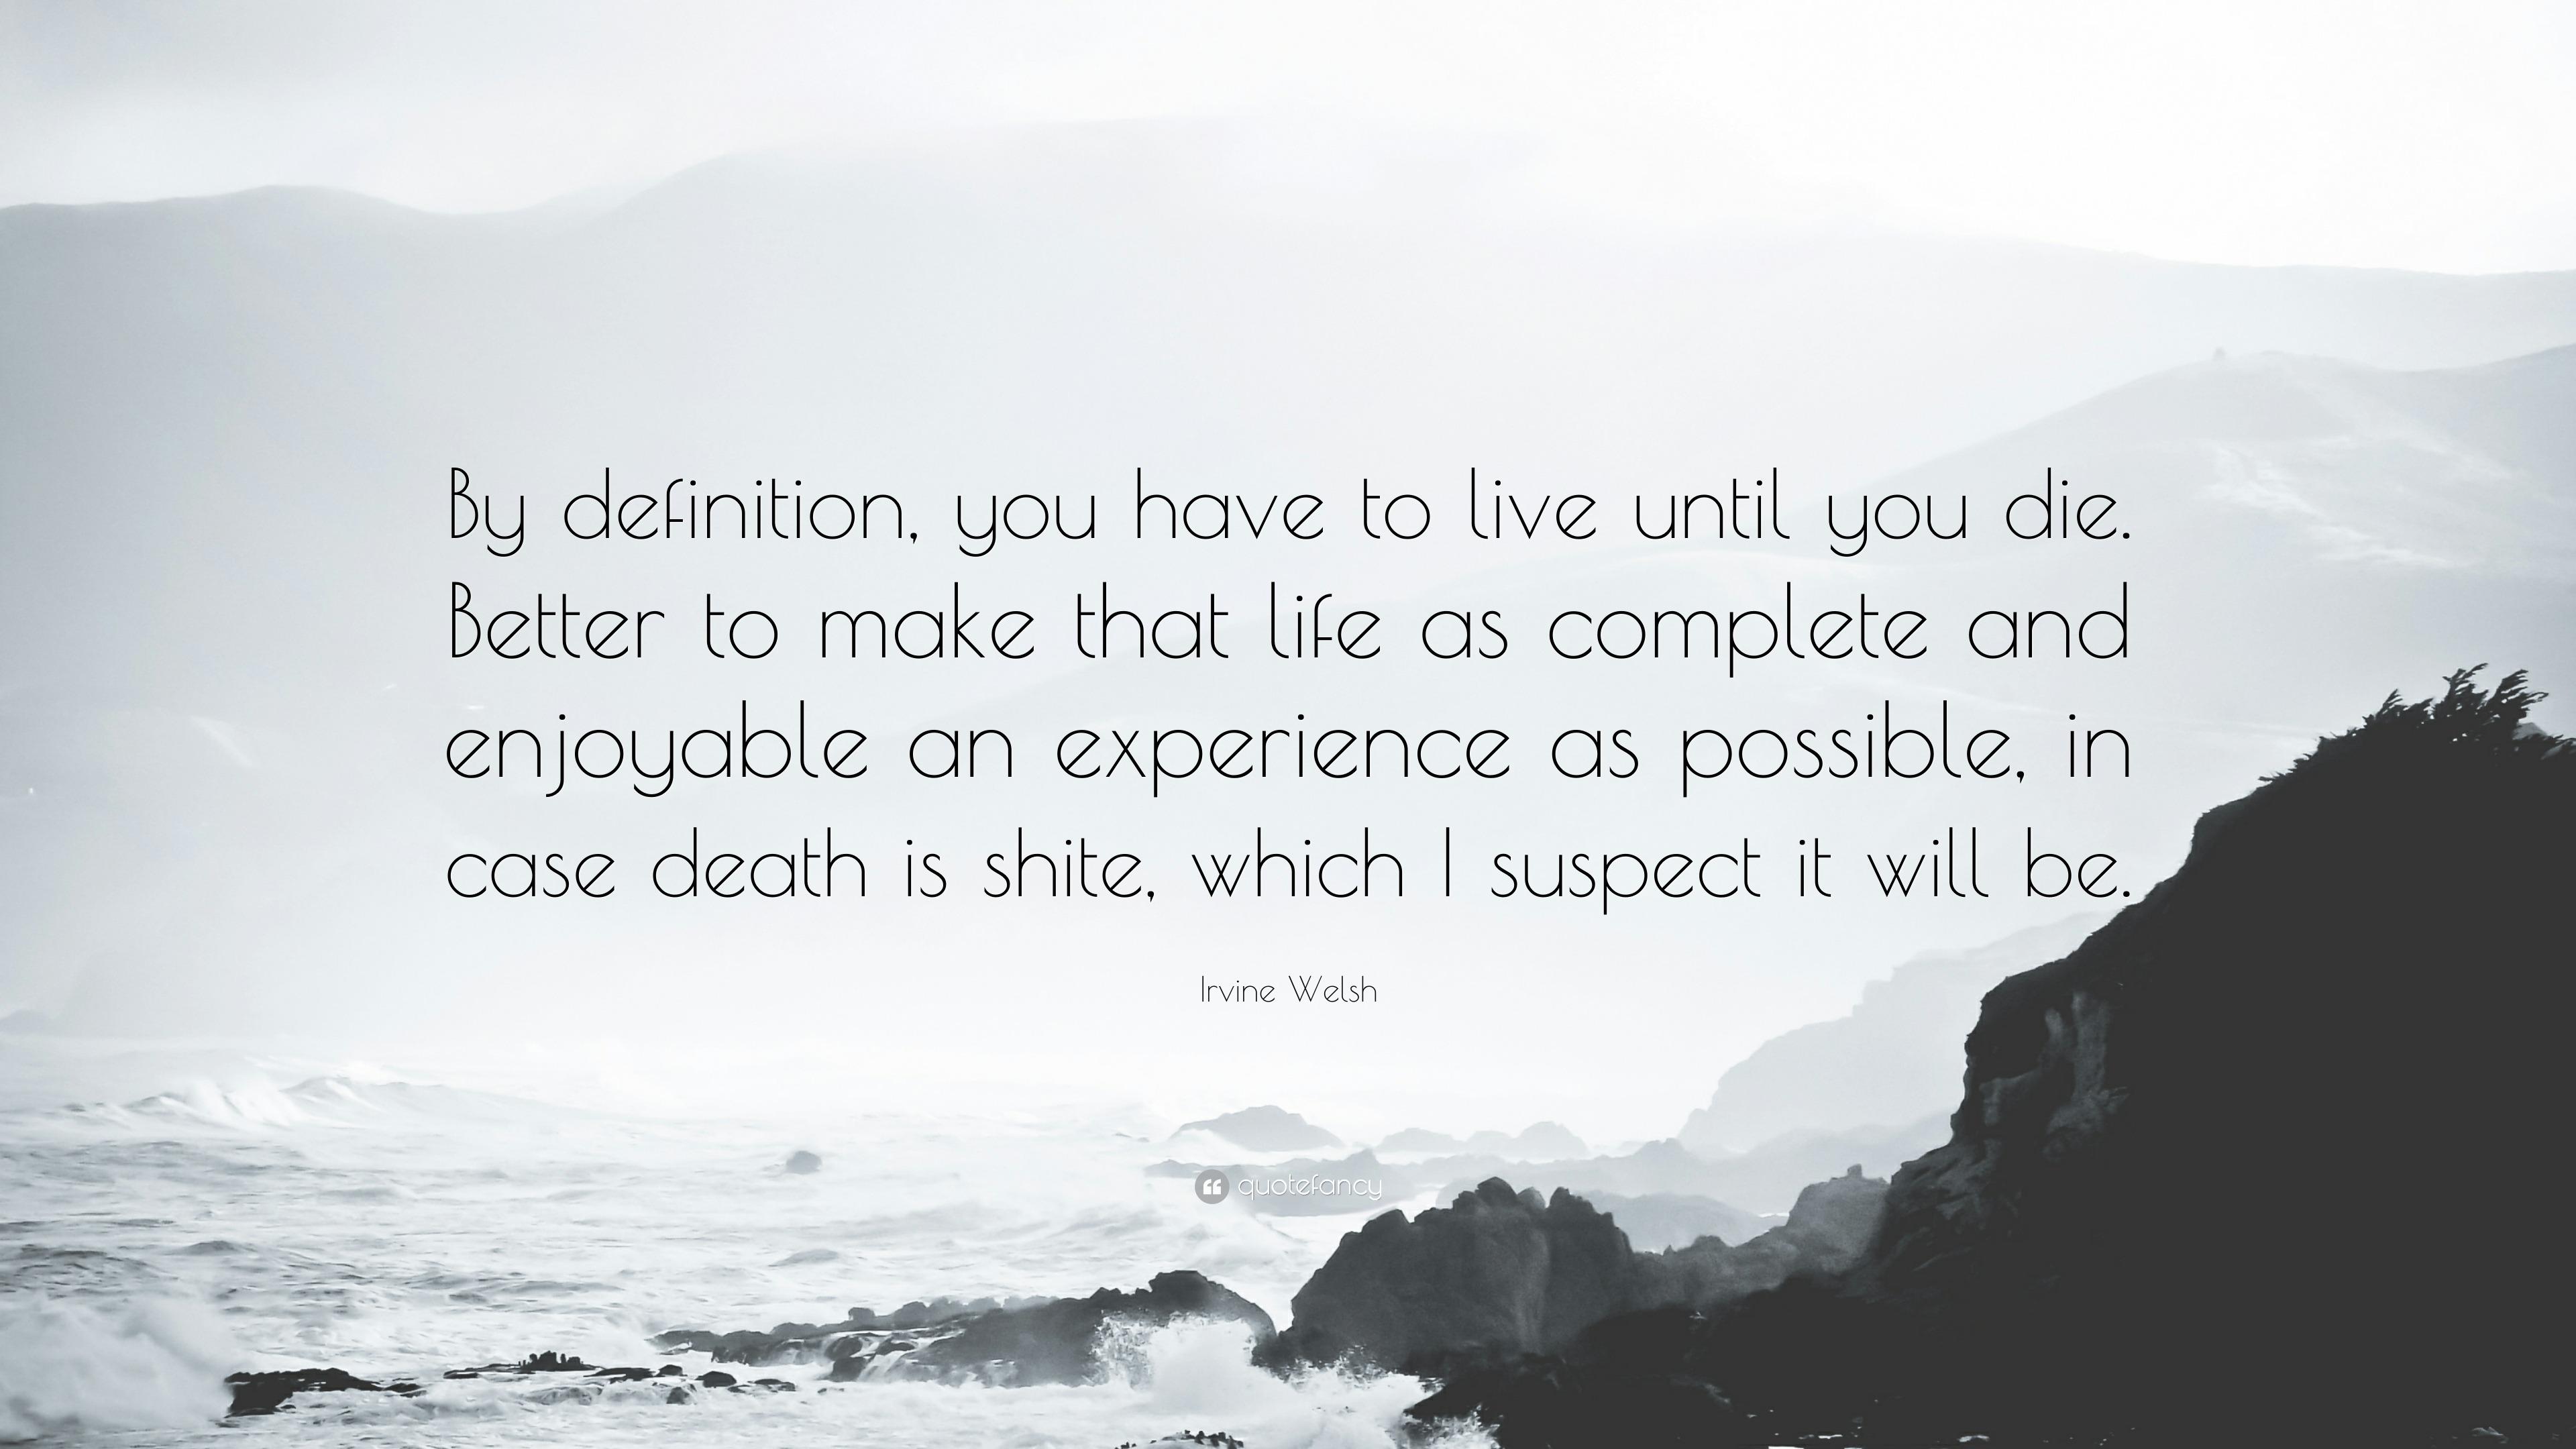 liv definition